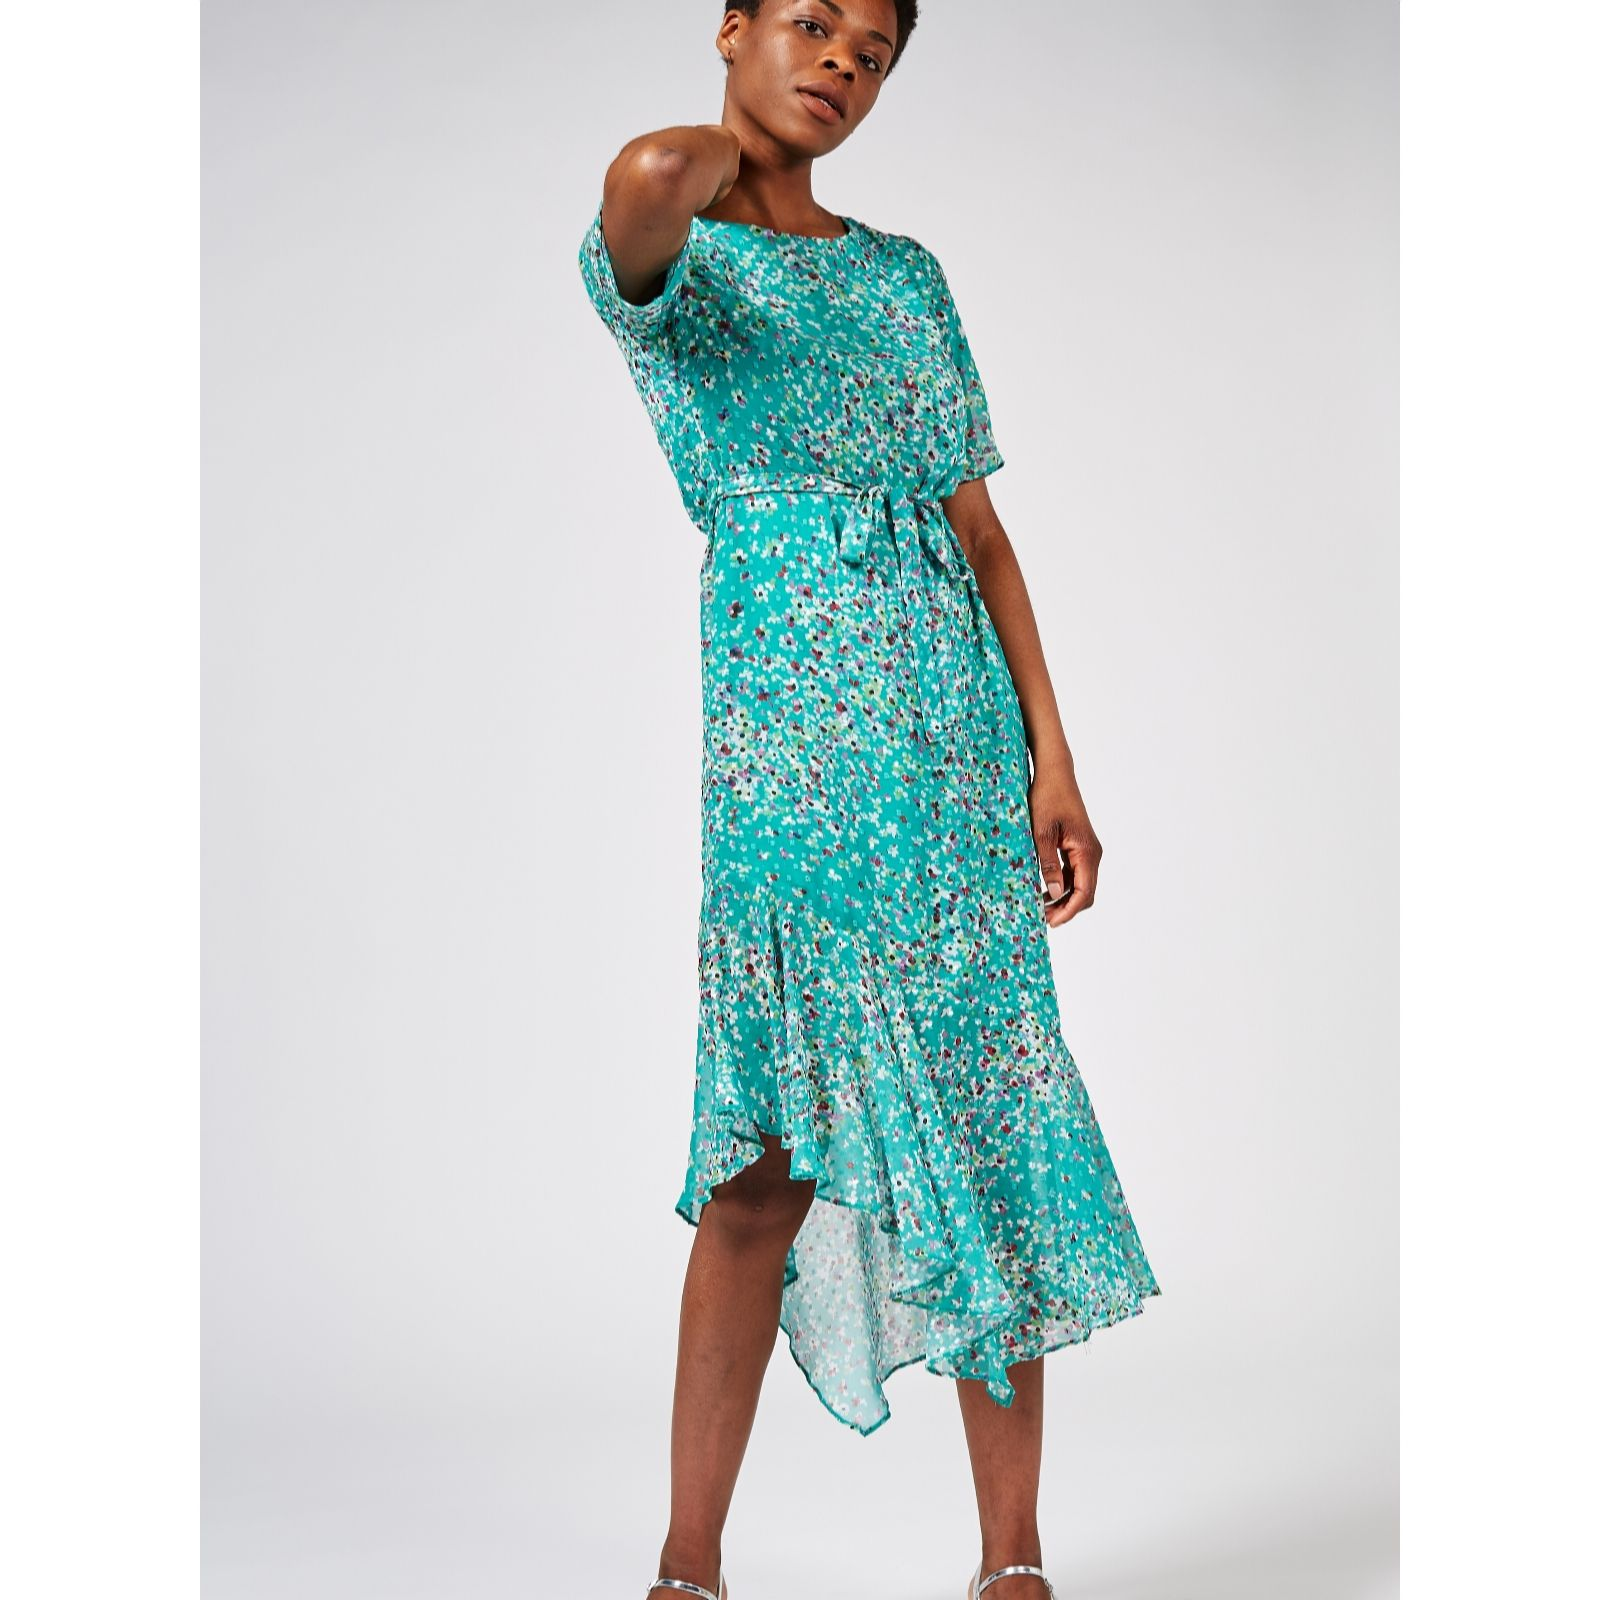 e460f7c6a87 Phase Eight Klara Printed Dress - QVC UK